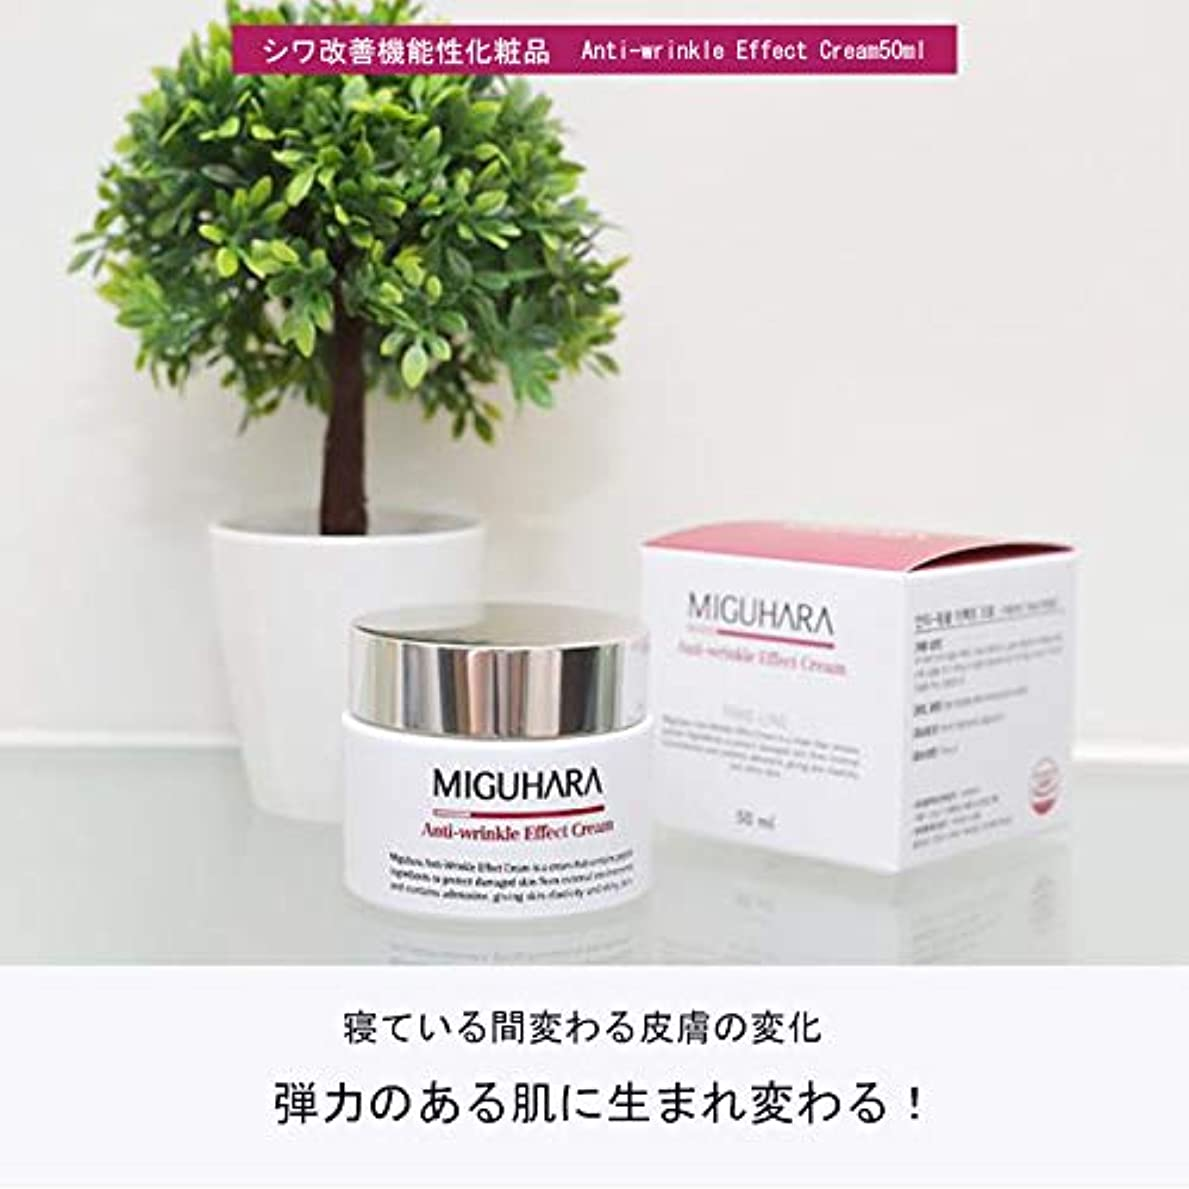 MIGUHARA アンチ-リンクルエフェクトクリーム 50ml / Anti-wrinkle Effect Cream 50ml